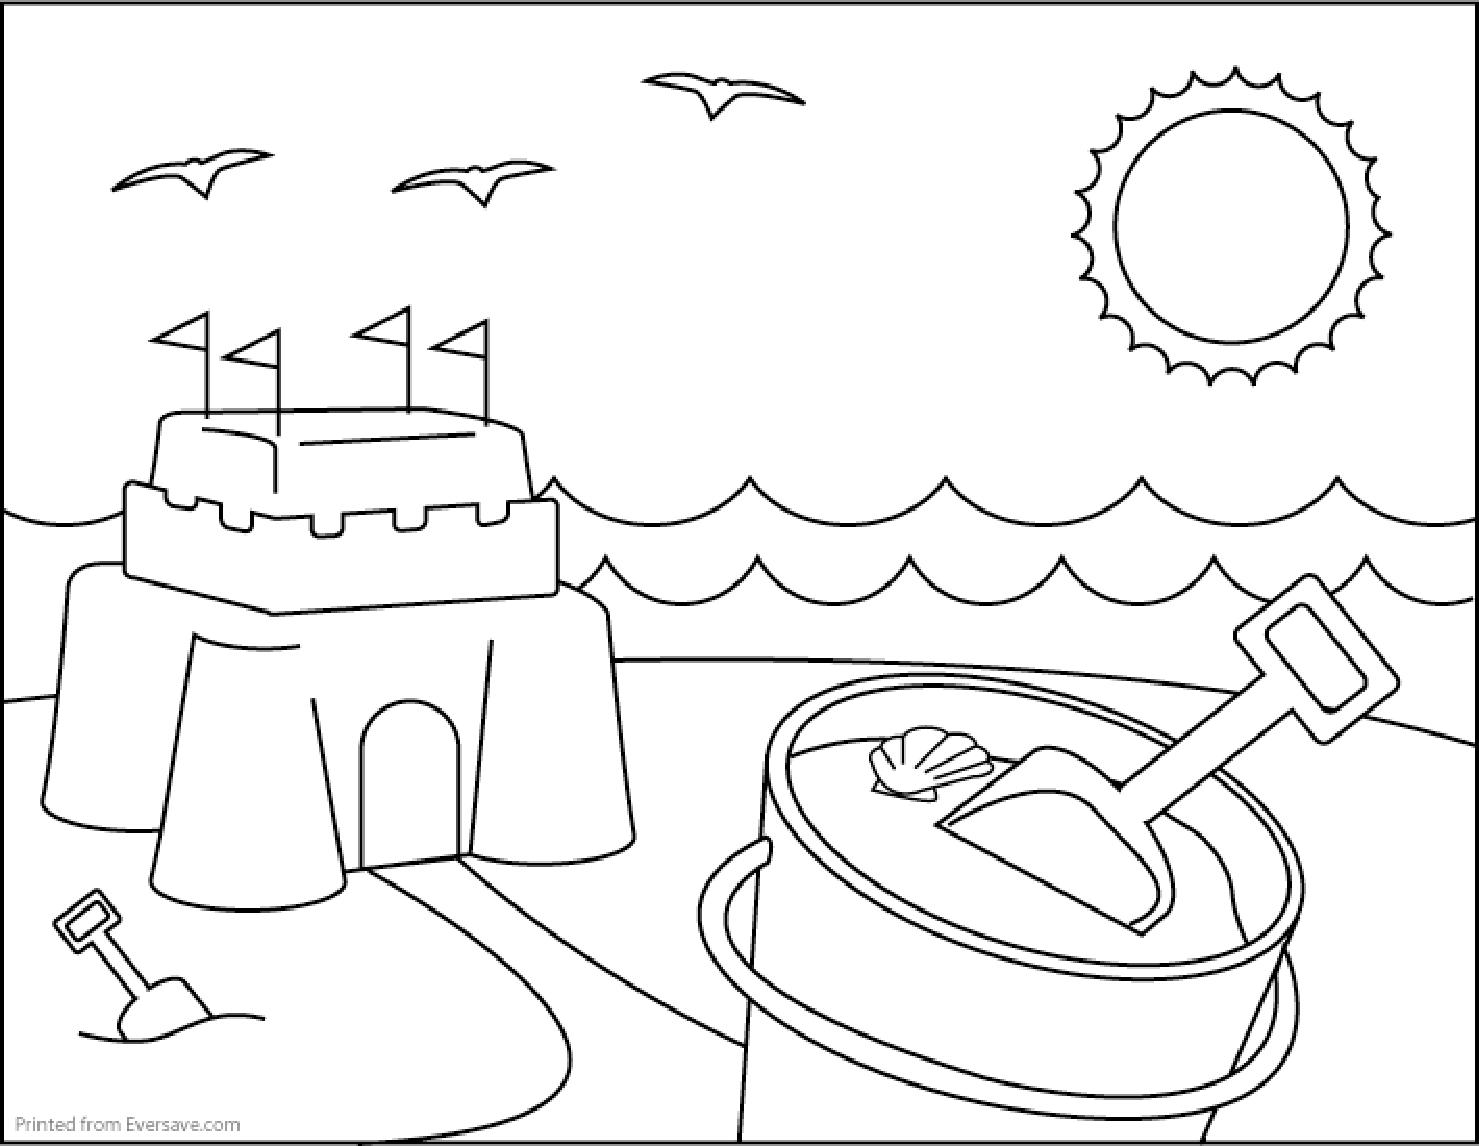 Pioneering Free Printable Summer Coloring Page  23727